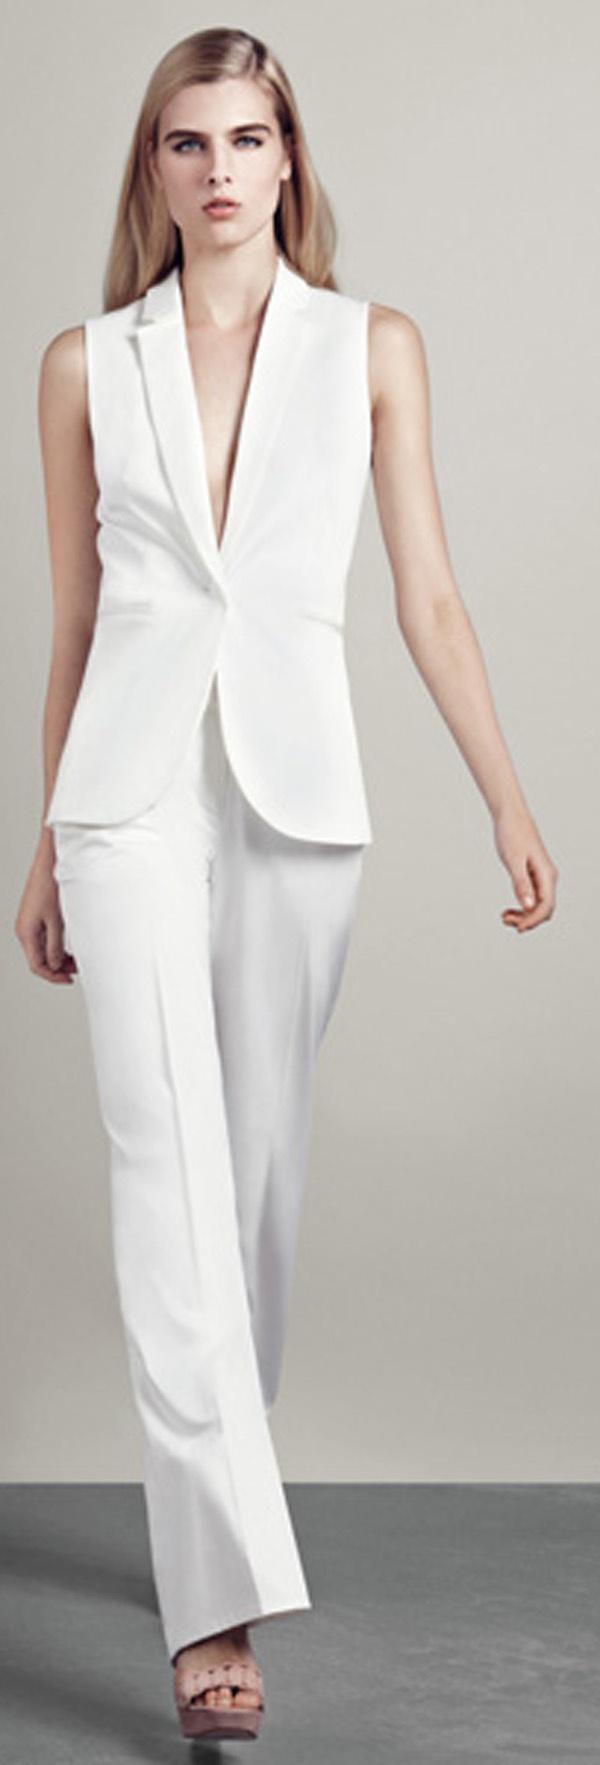 Wedding Pant Suit Women Clothing Www Tollebild Com